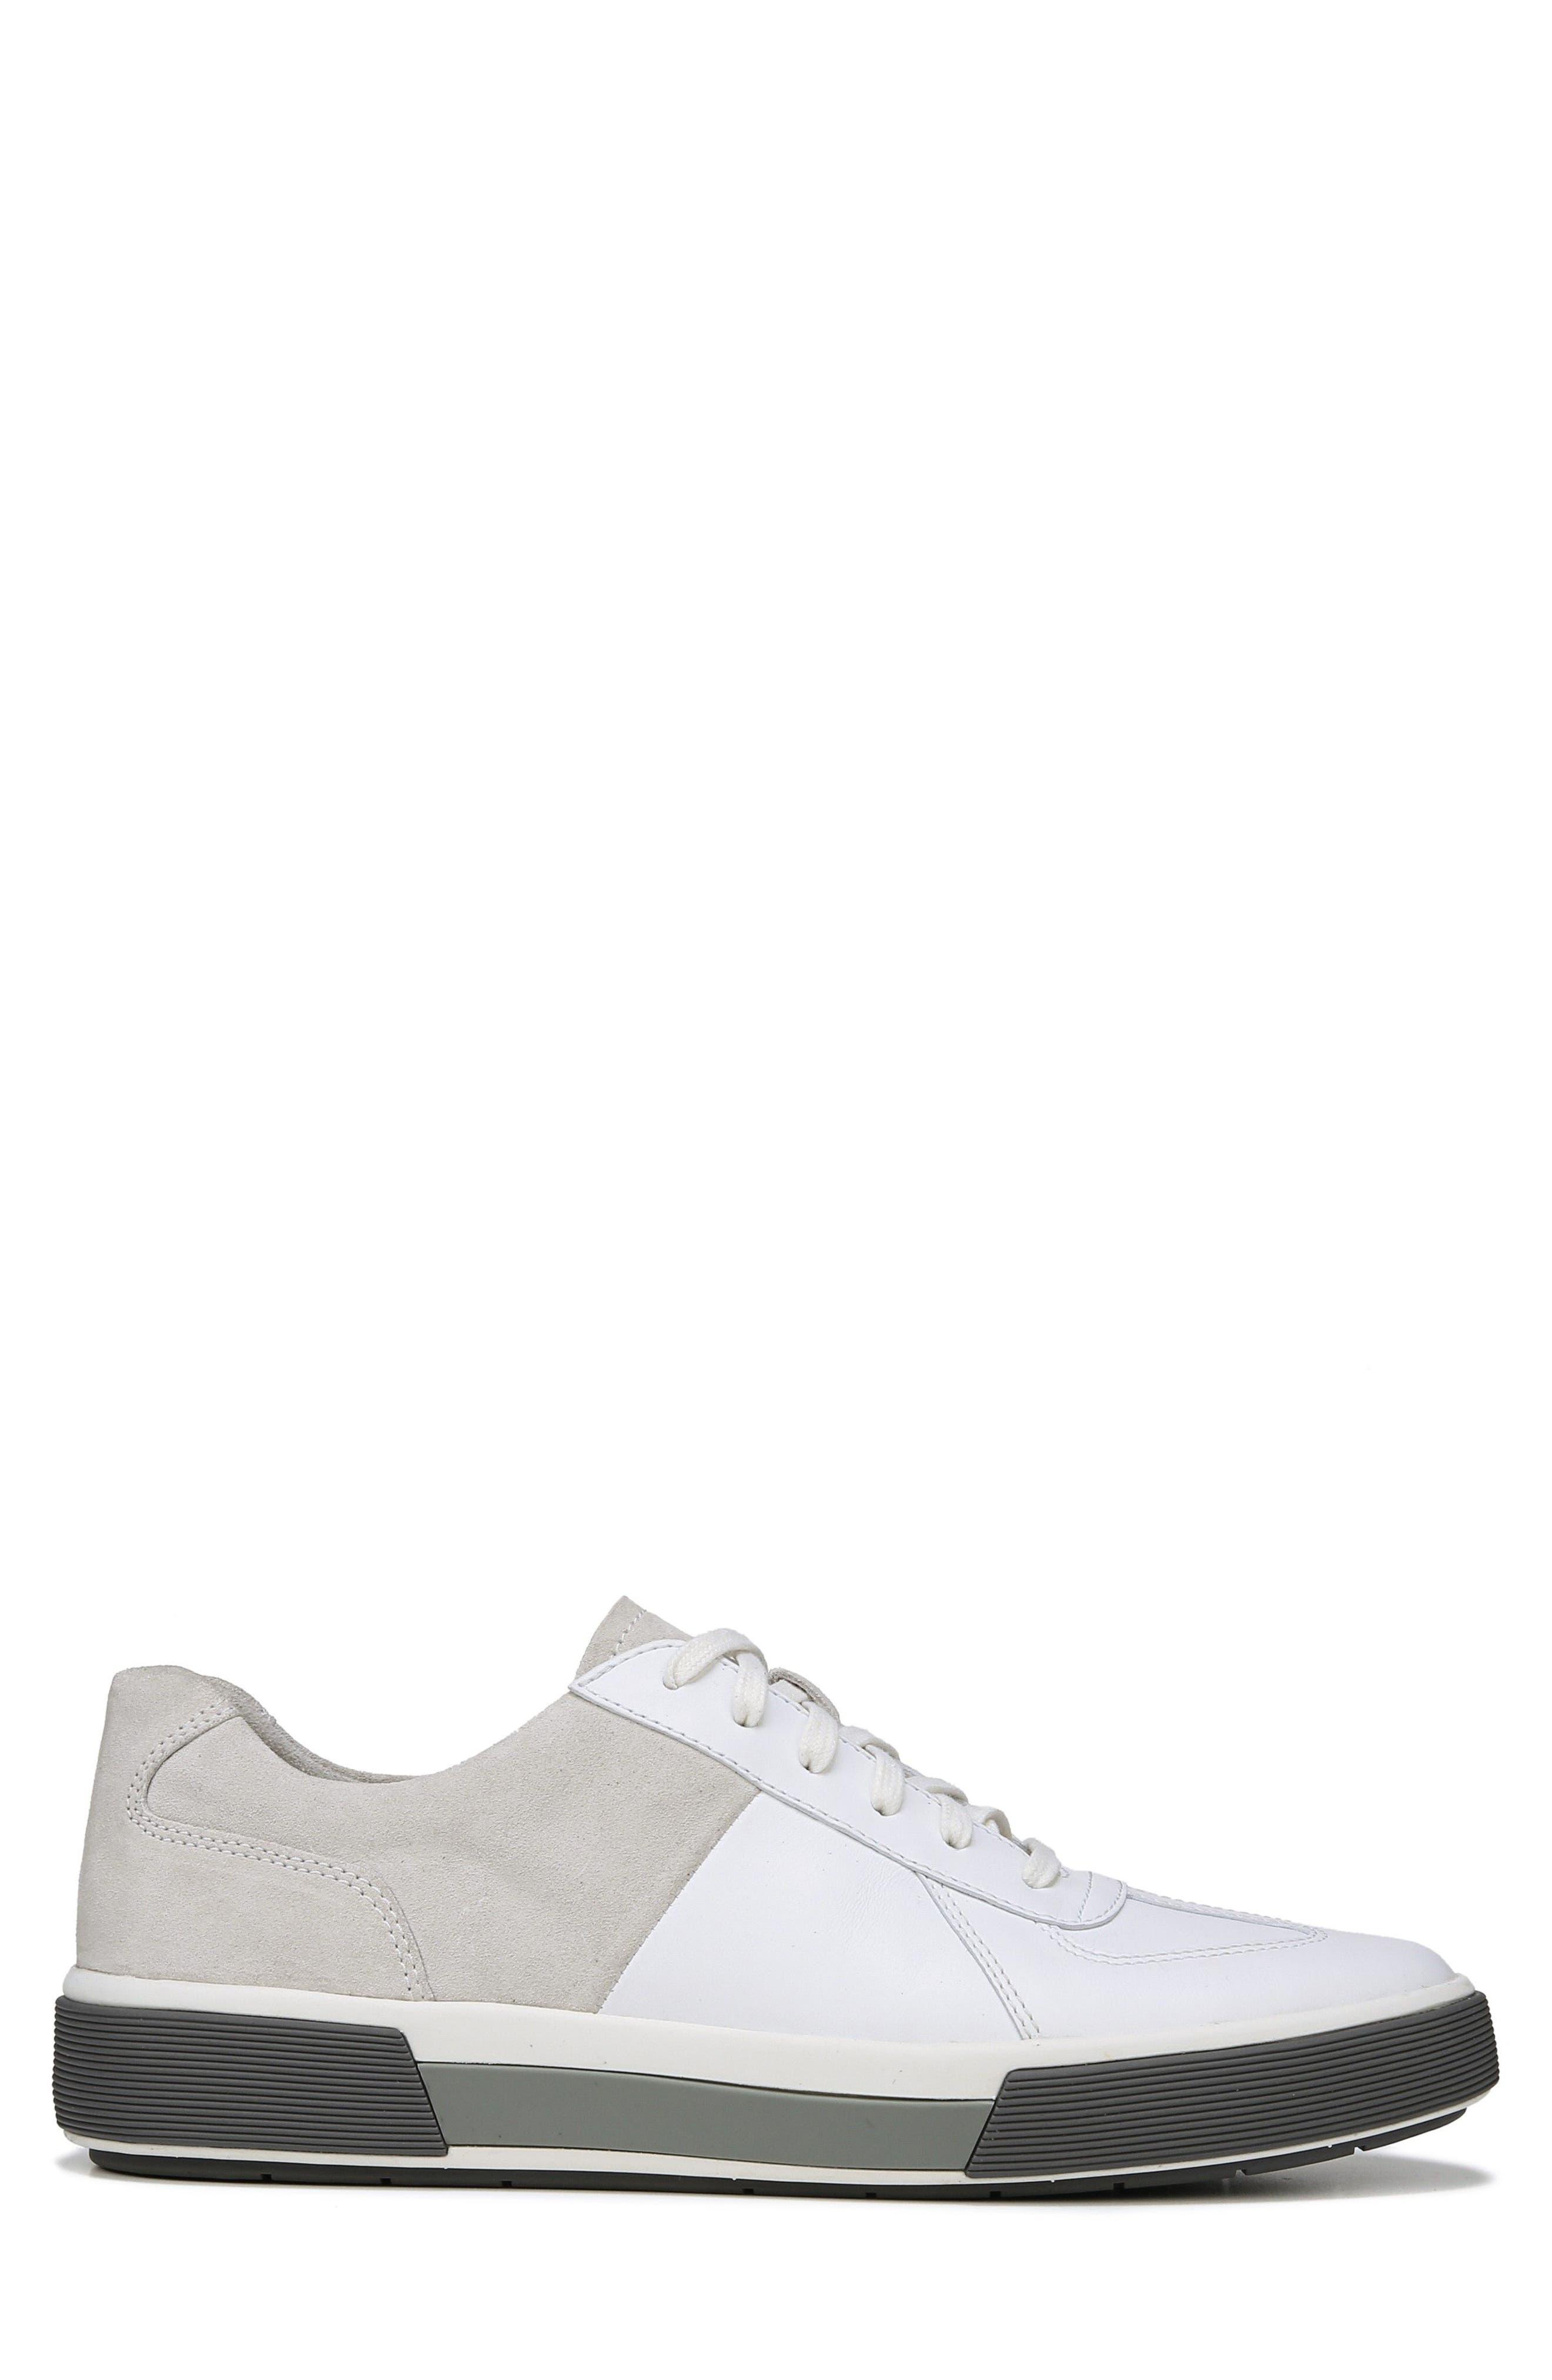 VINCE, Rogue Low Top Sneaker, Alternate thumbnail 3, color, WHITE/ HORCHATA